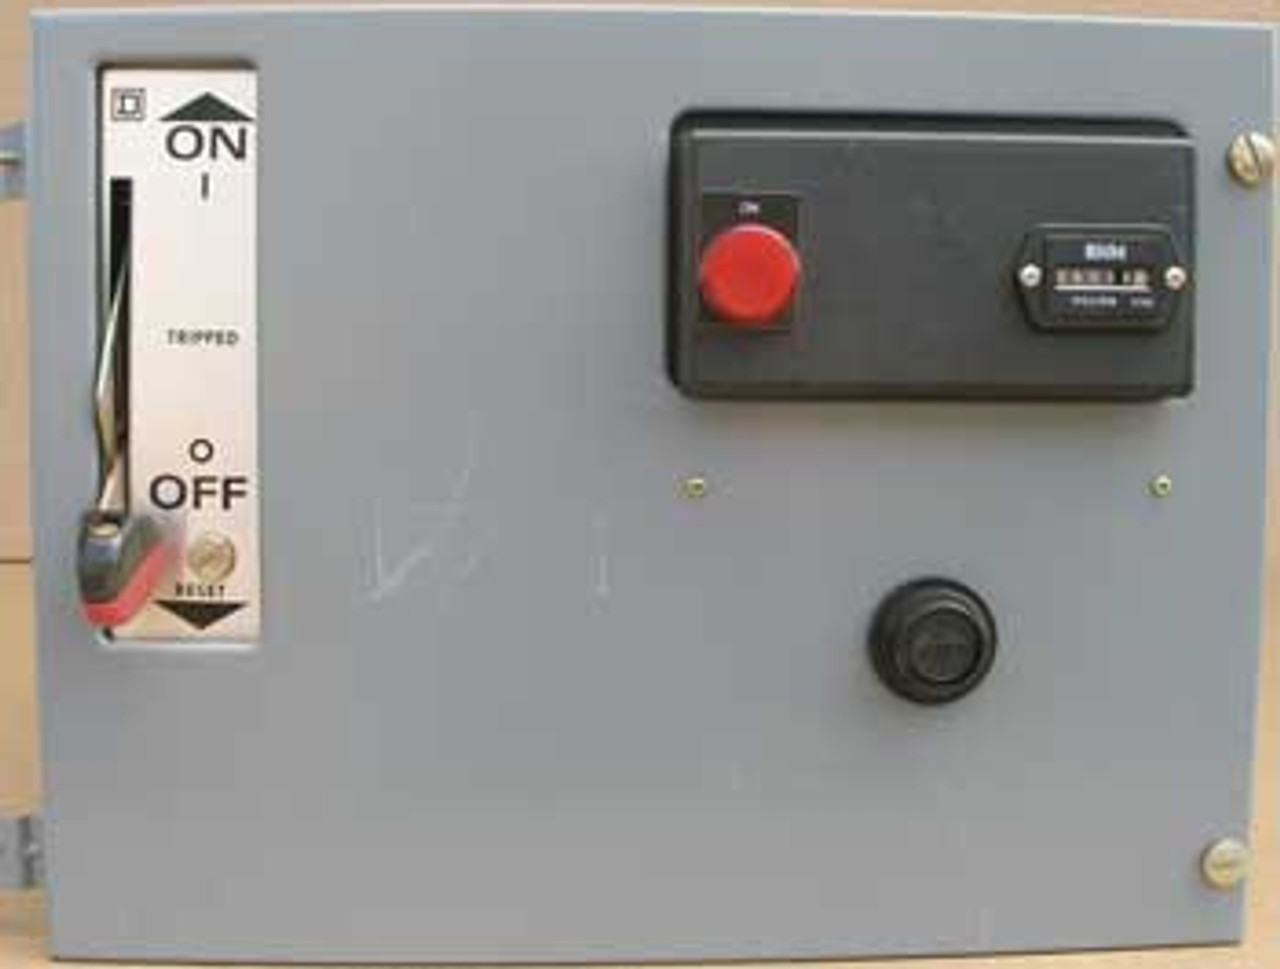 Square D Model 5 Size 1 Nema 7 Amp 600 Volts Motor Control Bucket - Used